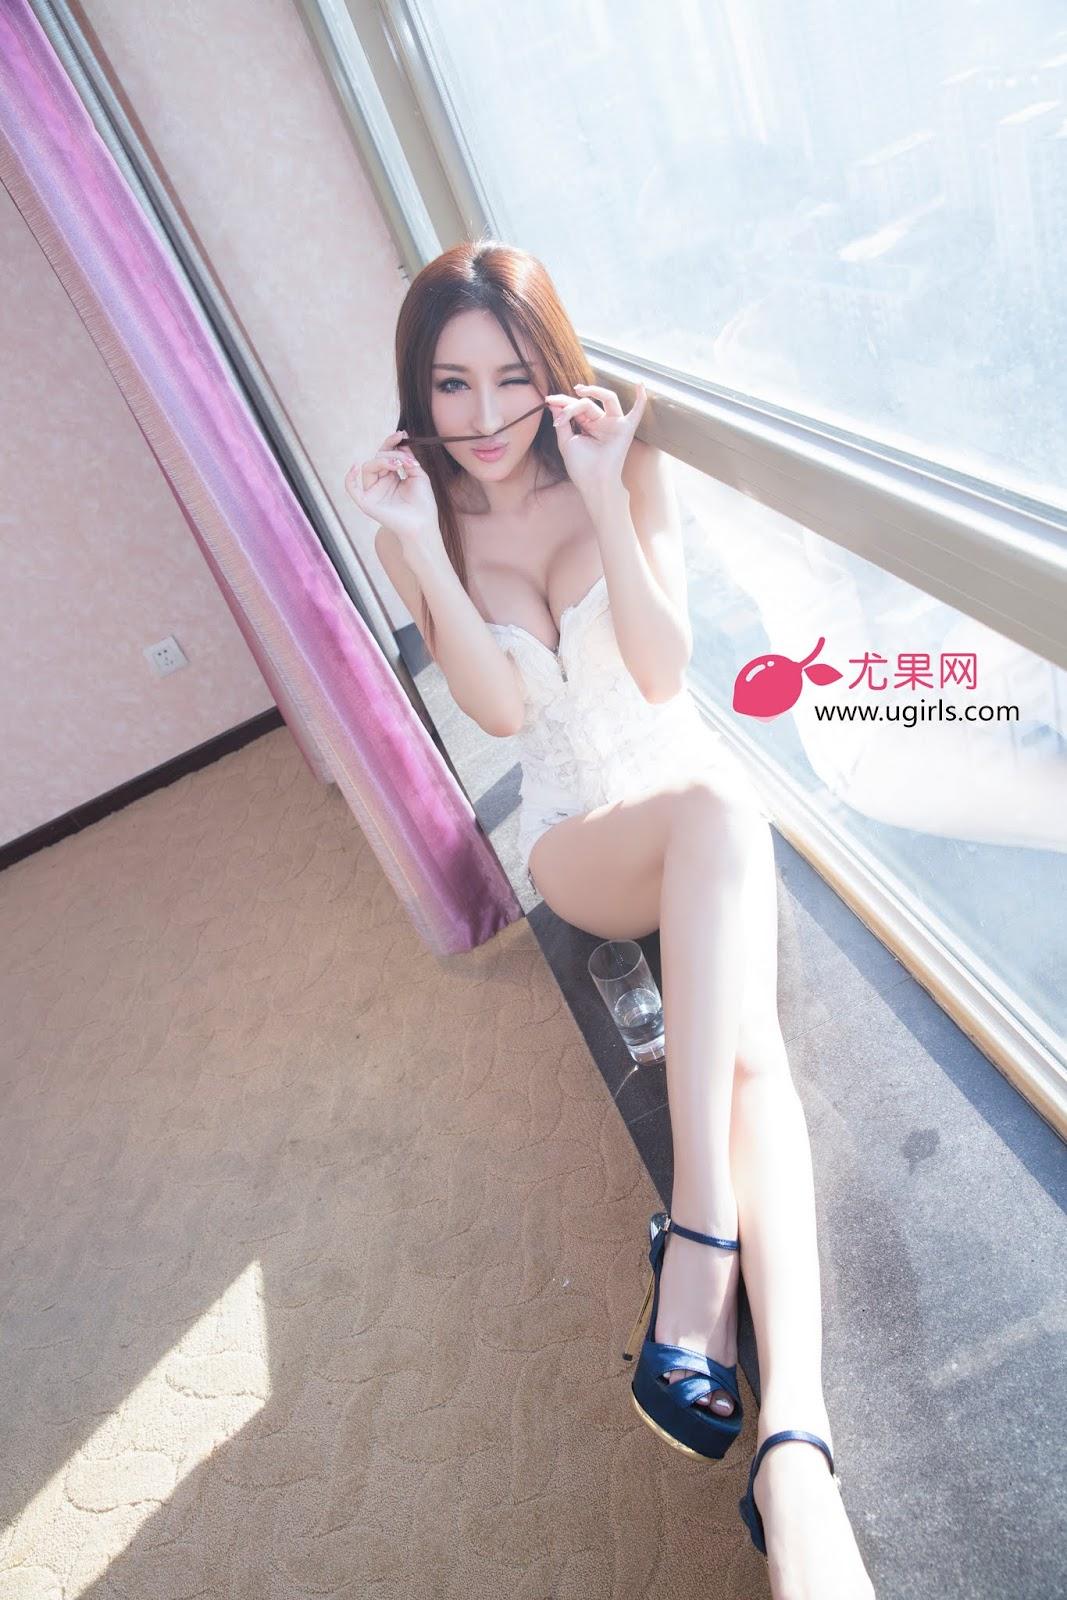 A14A6525 - Hot Photo UGIRLS NO.6 Nude Girl